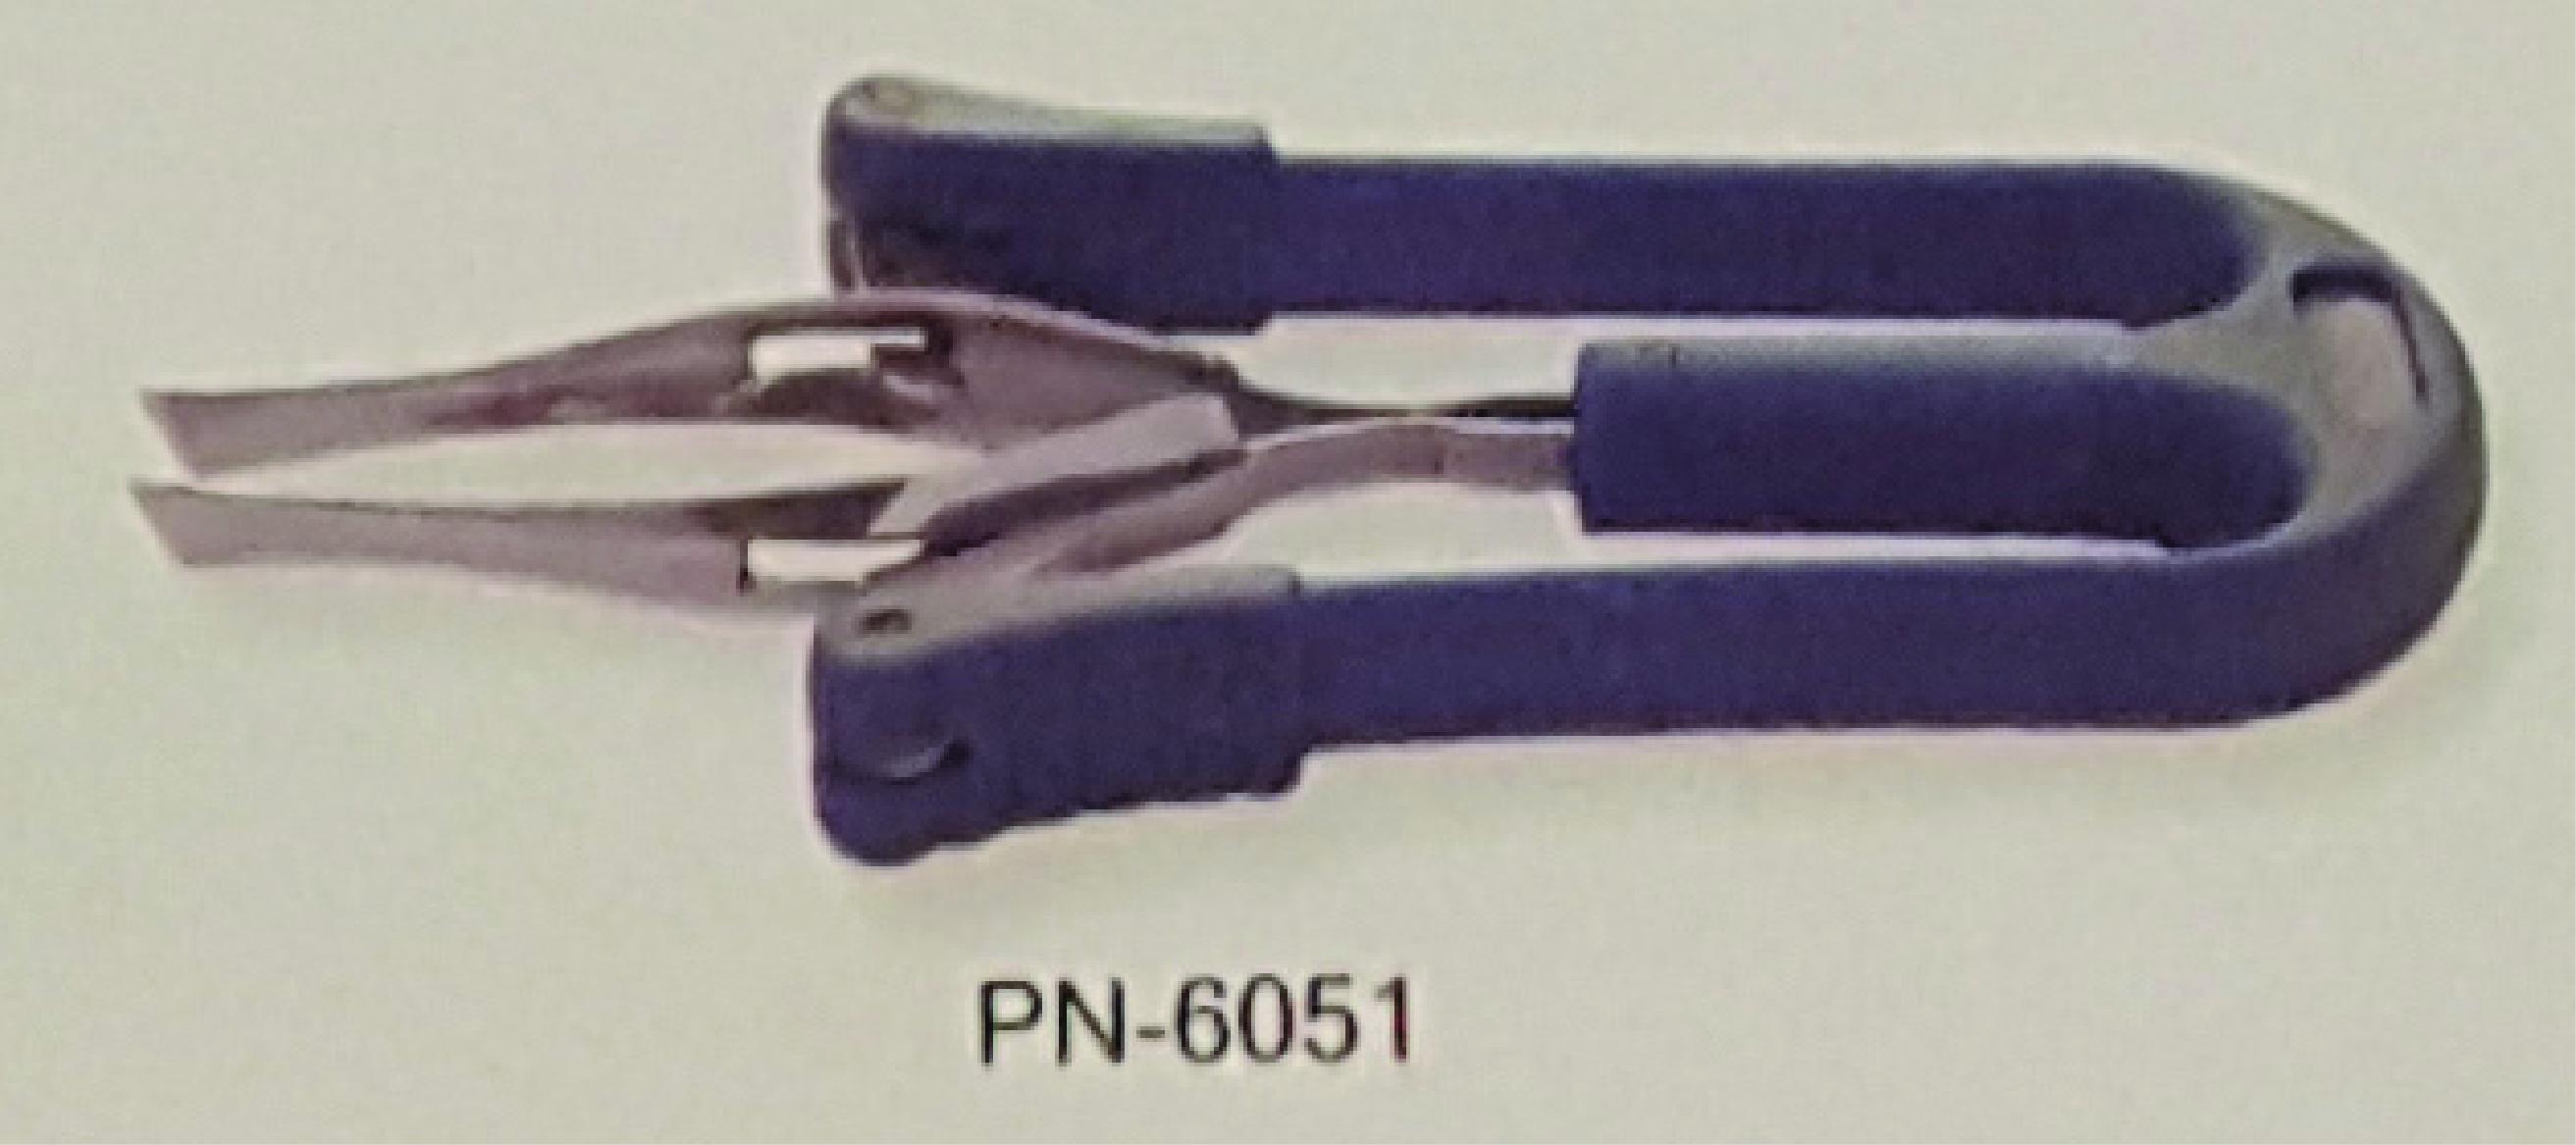 PN-6051